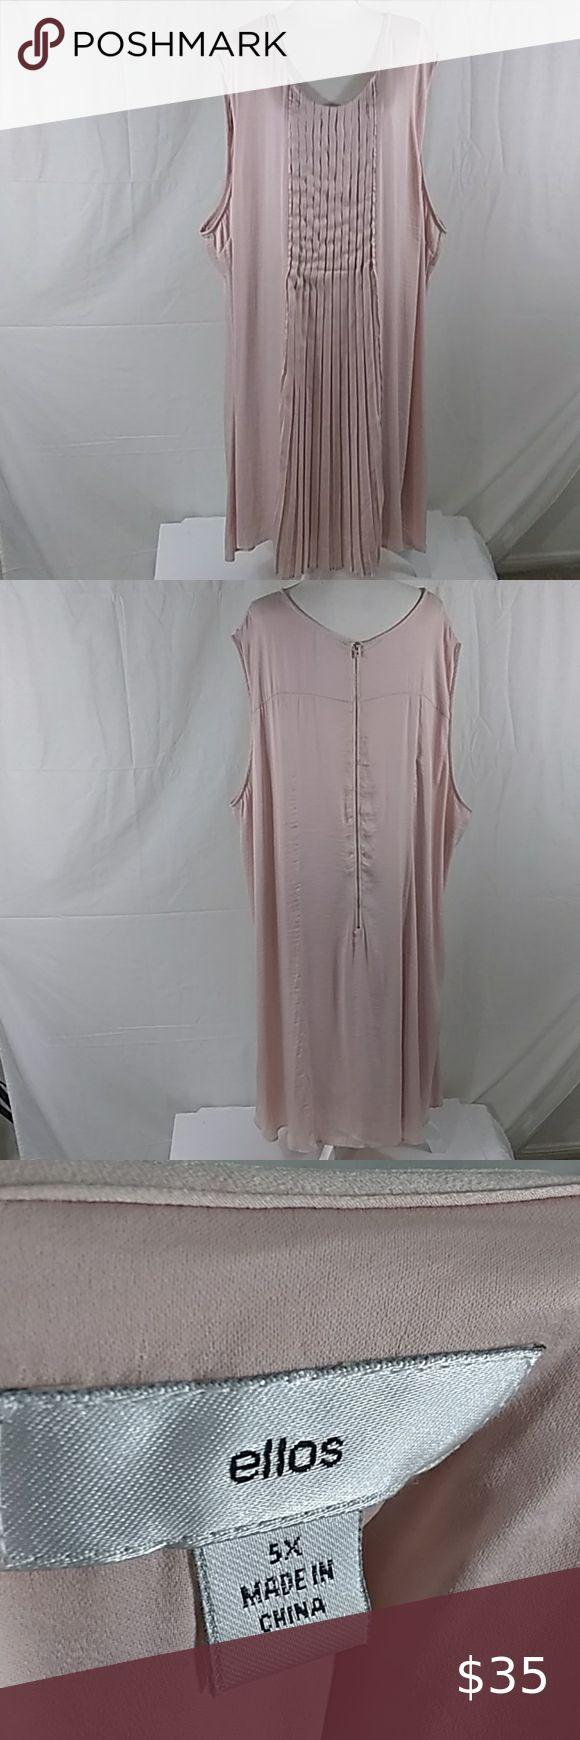 Ellos Plus Size Dress 5x Plus Size Dress Pink Maxi Dress Pink Maxi [ 1740 x 580 Pixel ]